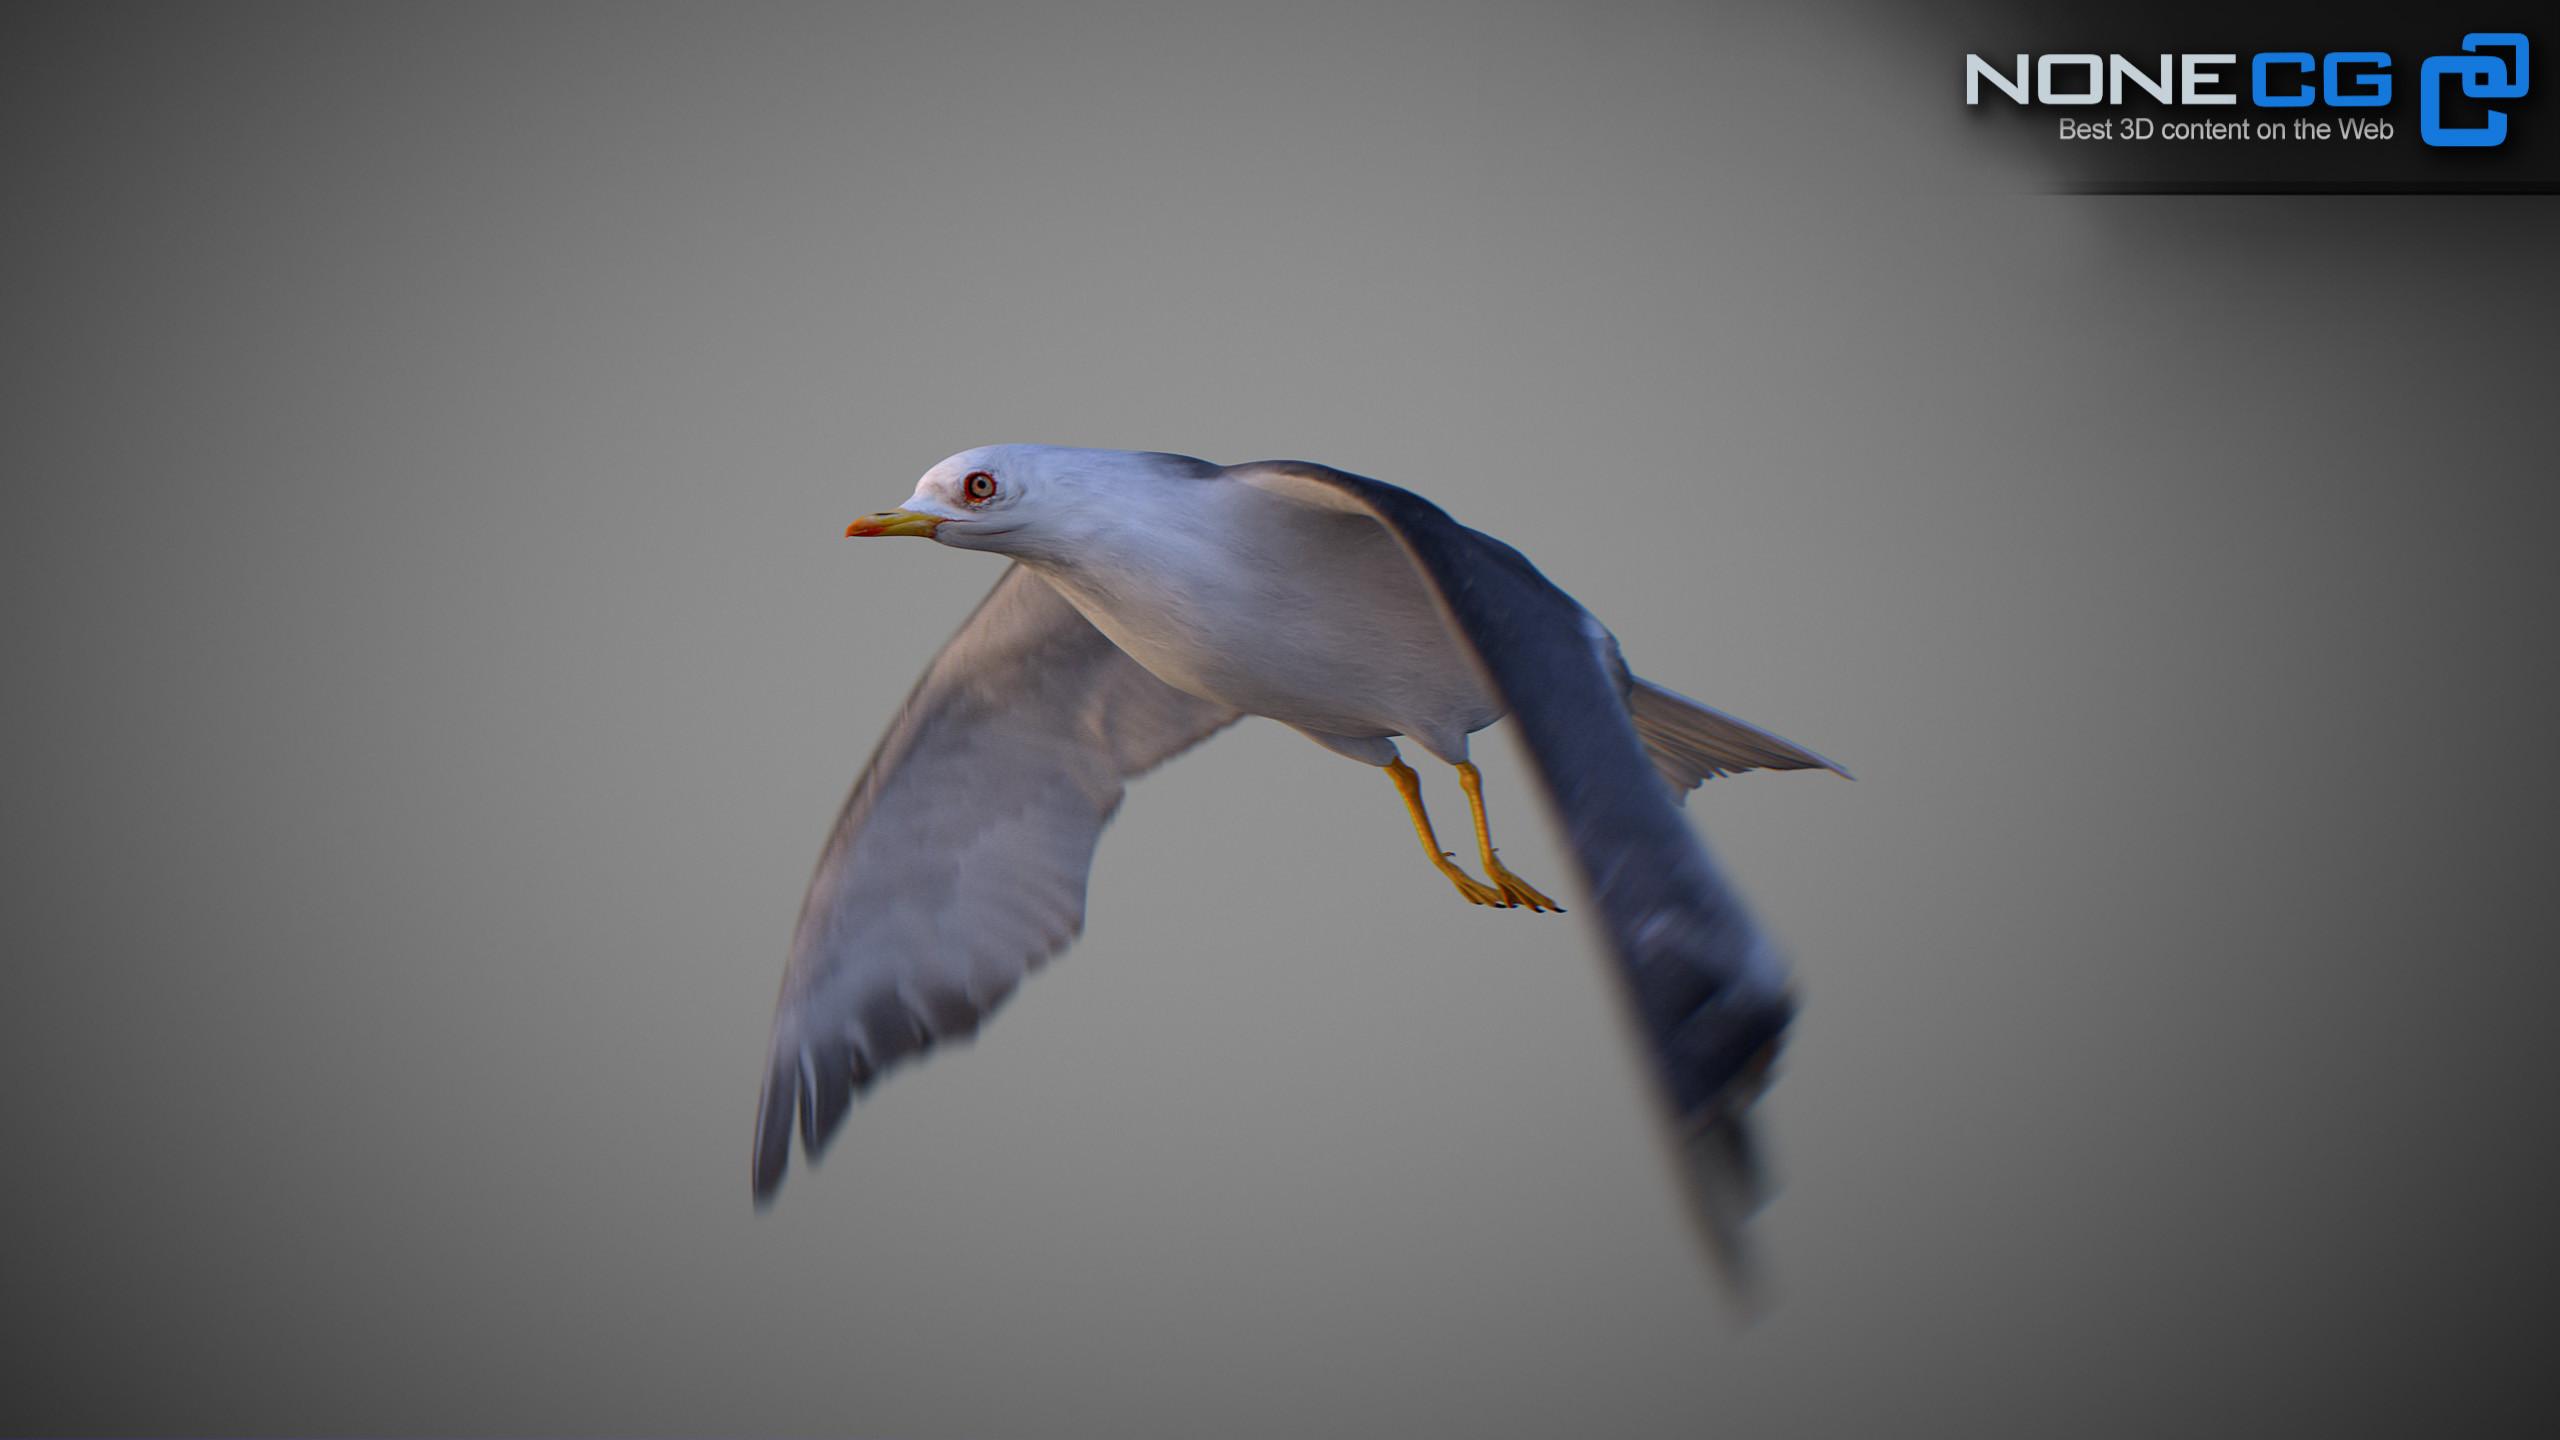 E:\[CAT]_Birds\Seagull Animated